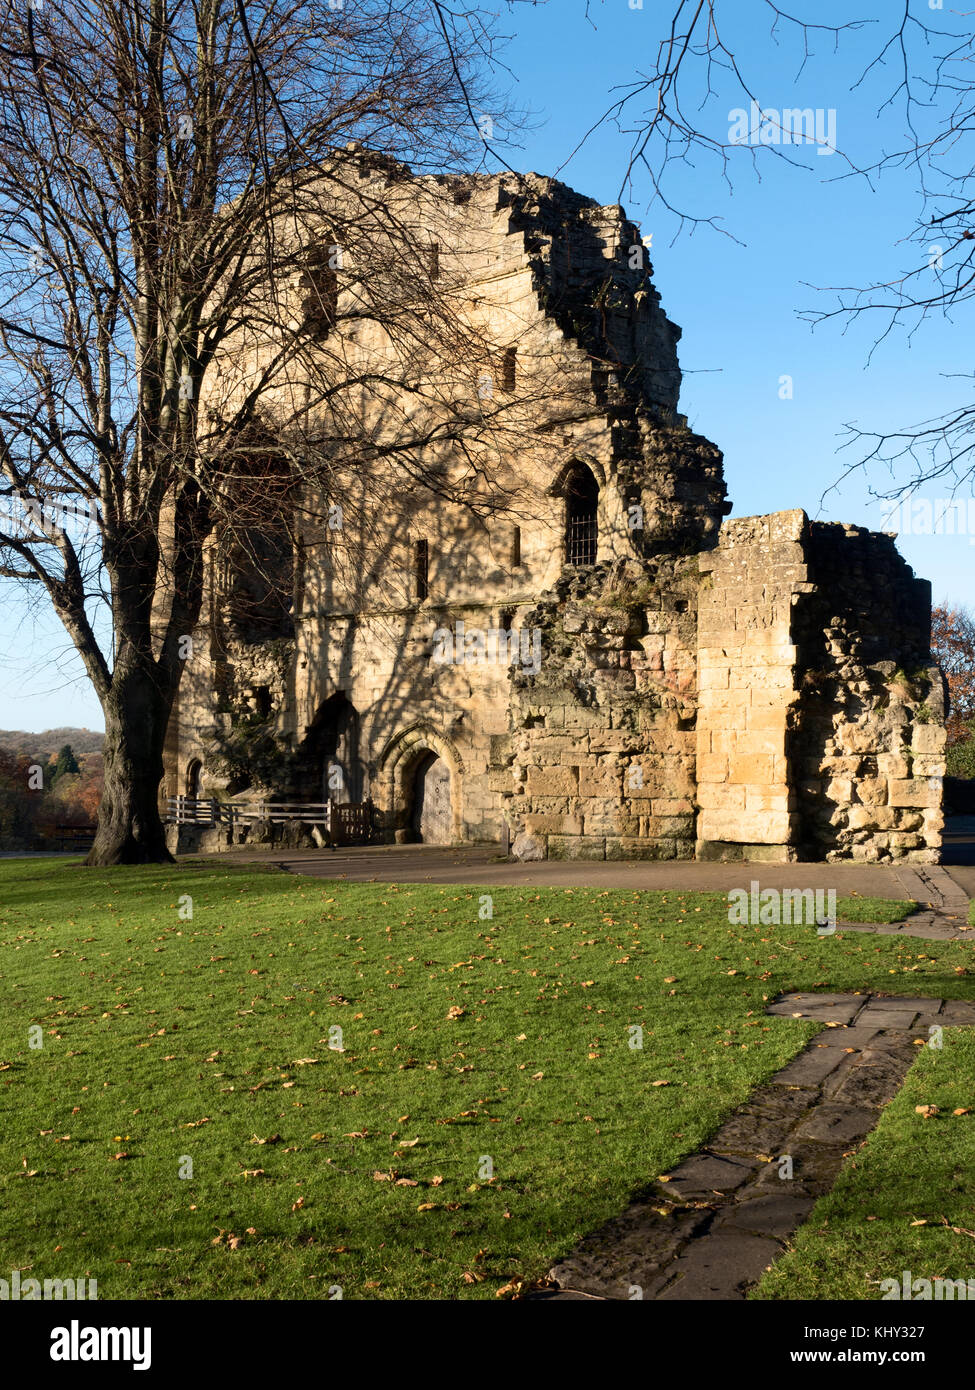 The Kings Tower at Knaresborough Castle in Autumn Knaresborough North Yorkshire England - Stock Image